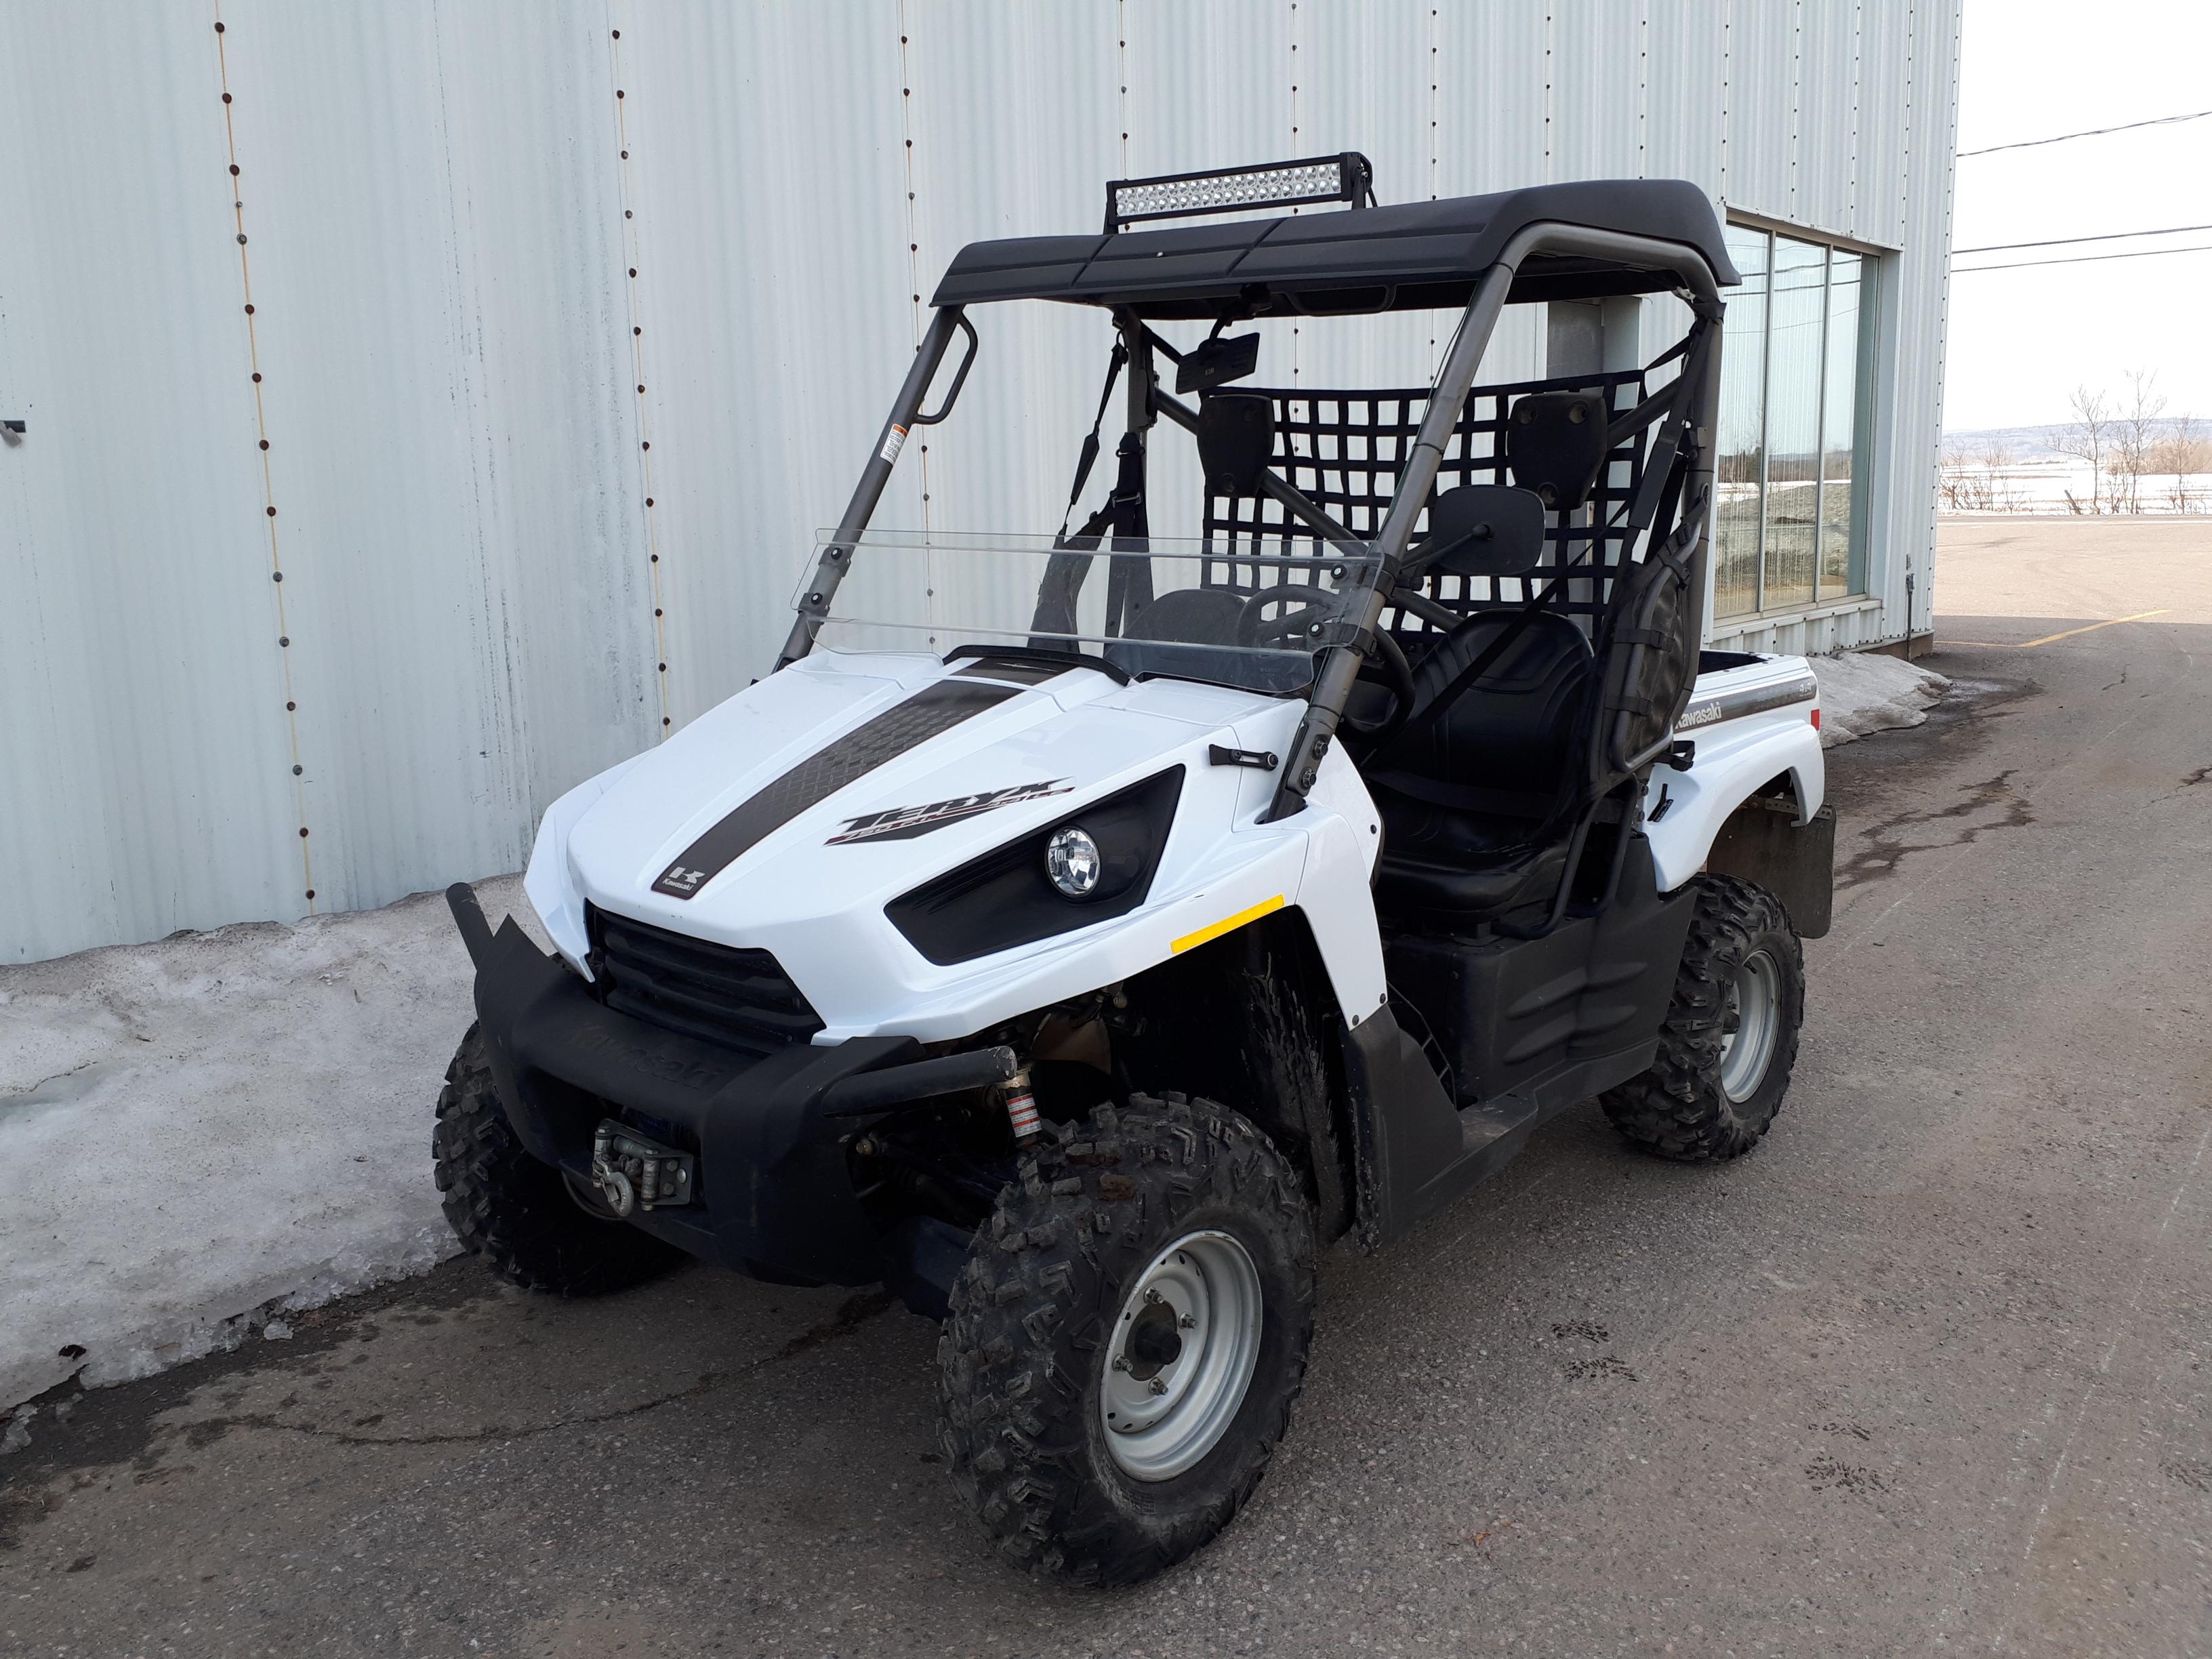 Kawasaki Teryx 750 LE 2013